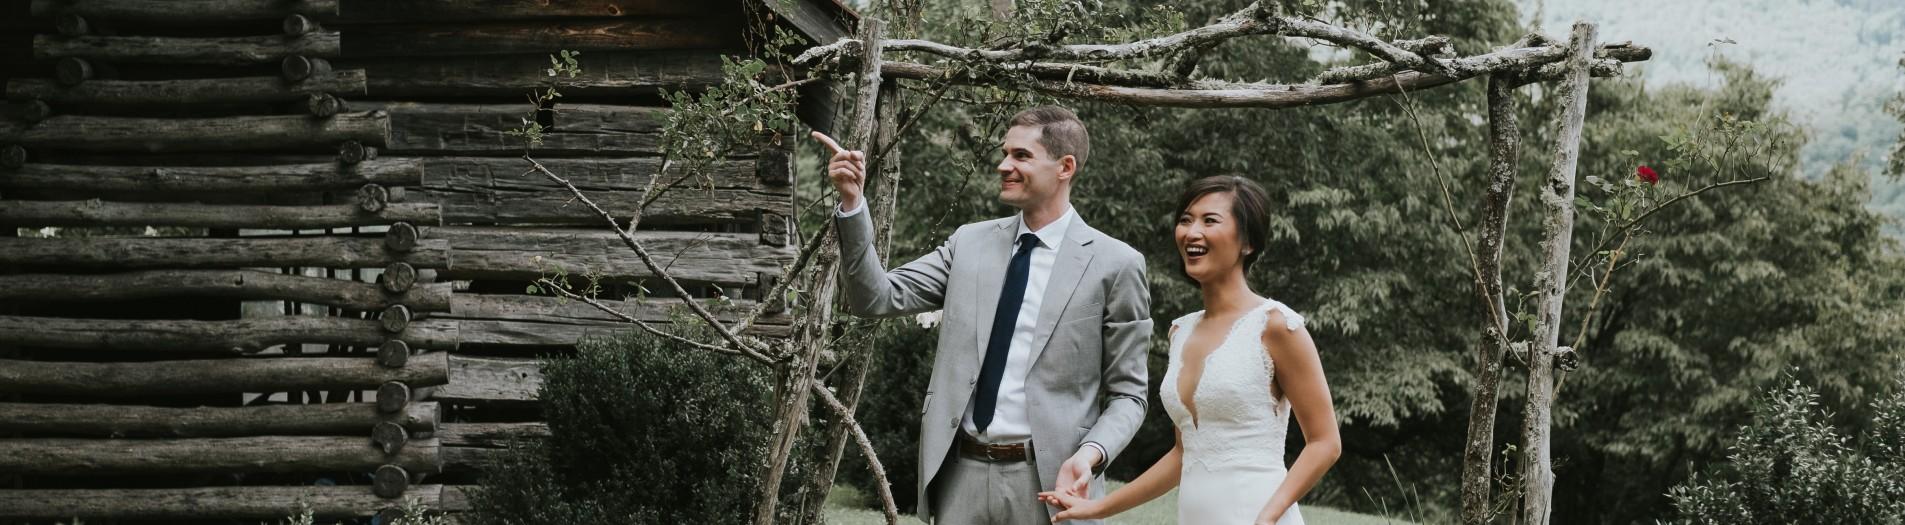 Merrybelle + Patrick   Vineyard Wedding in the North Carolina Blue Ridge Mountains